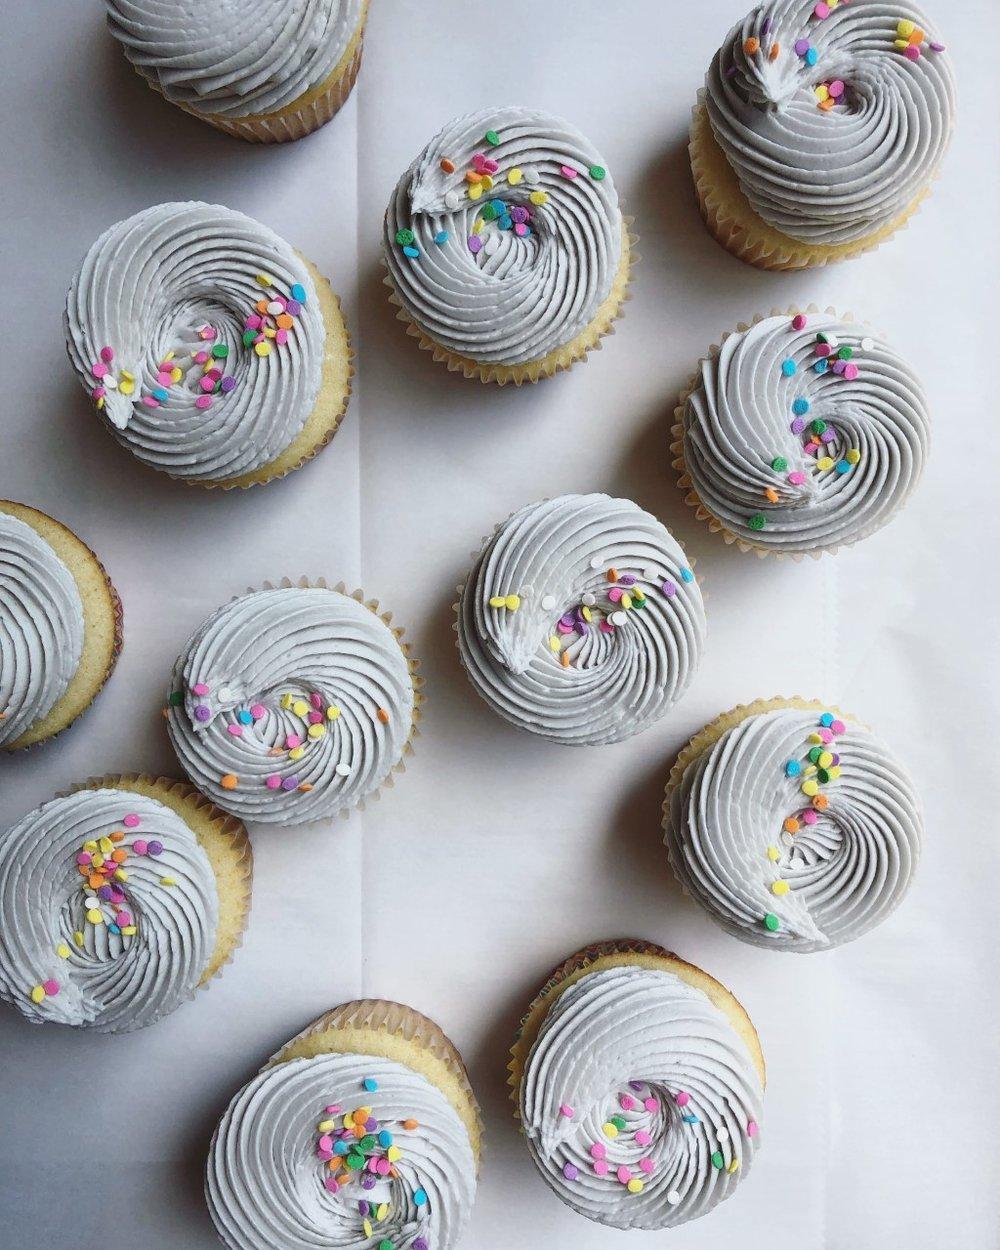 vanillacupcakes.jpg